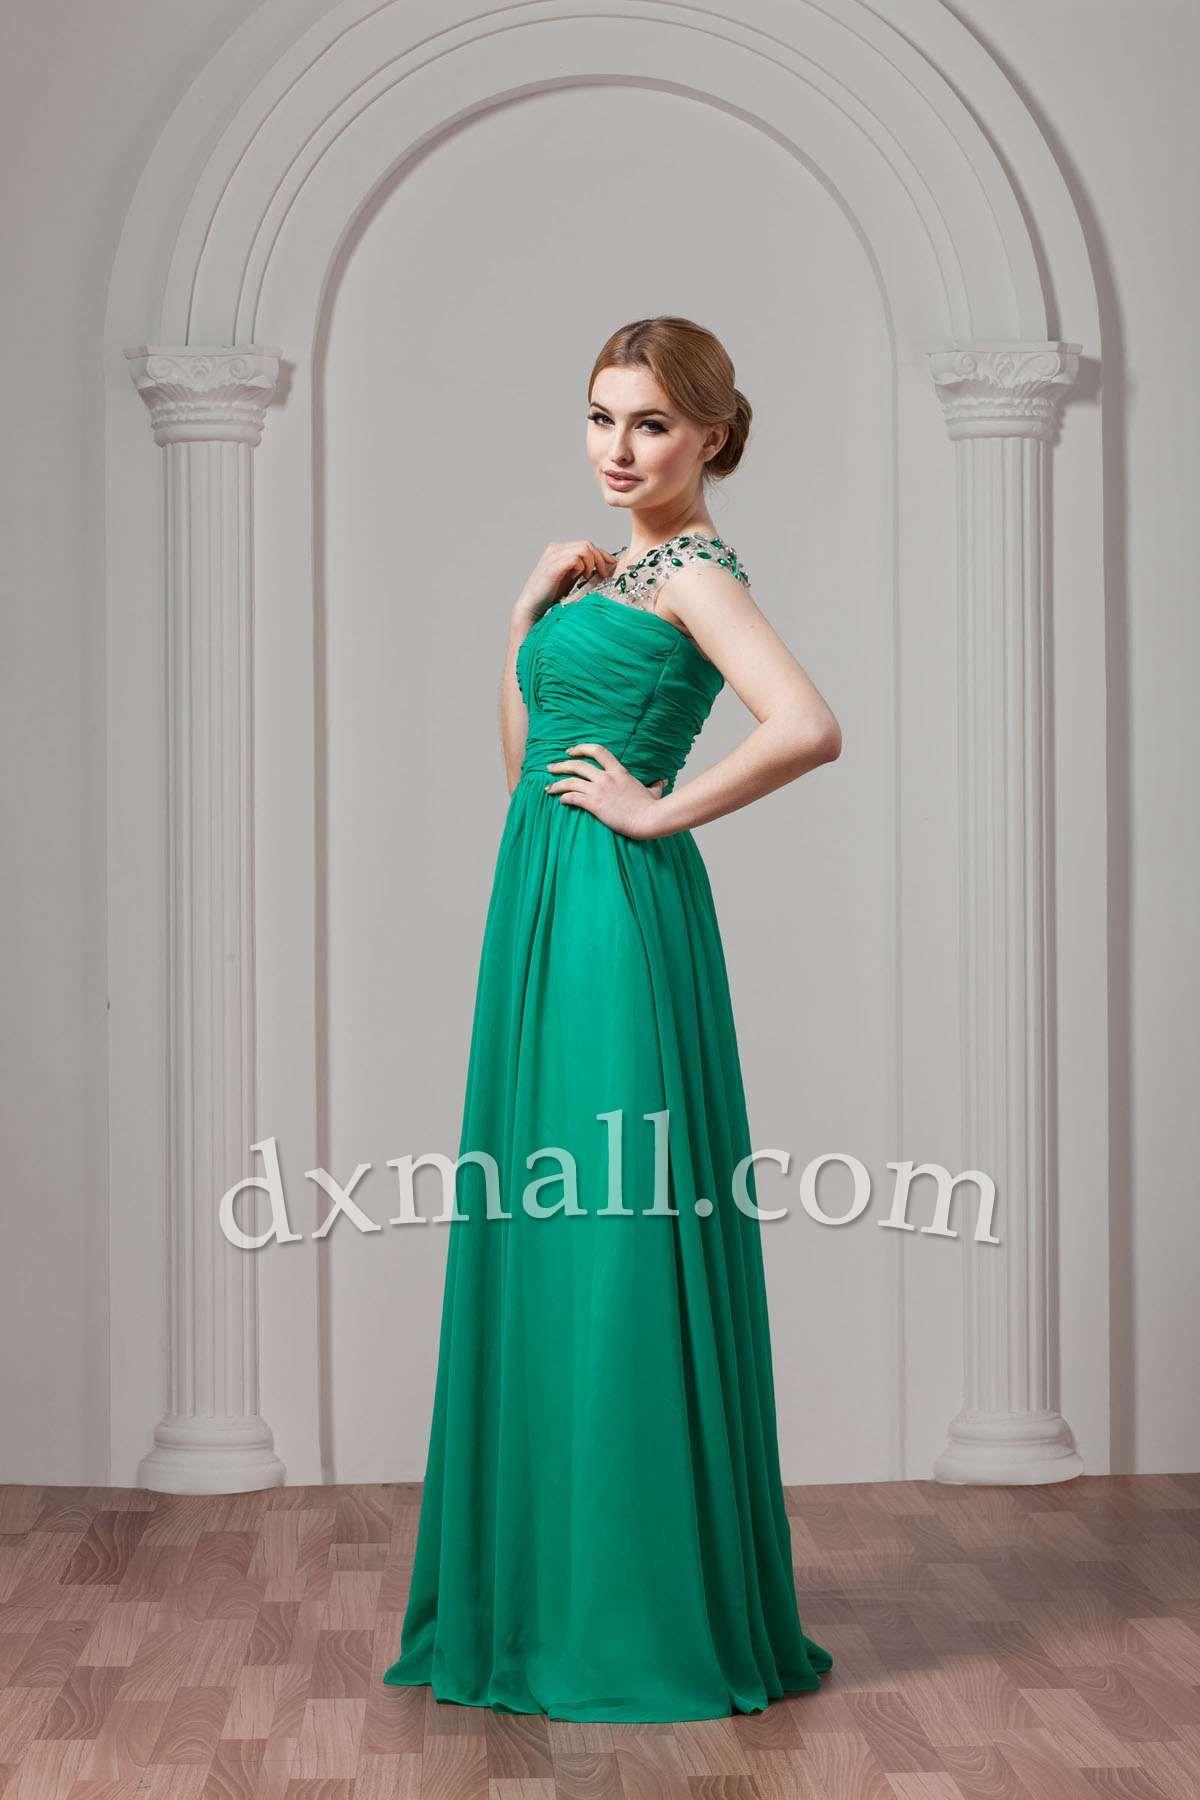 Green dress for wedding party  Drop Waist Wedding Guest Dresses Straps SweepBrush Train Chiffon